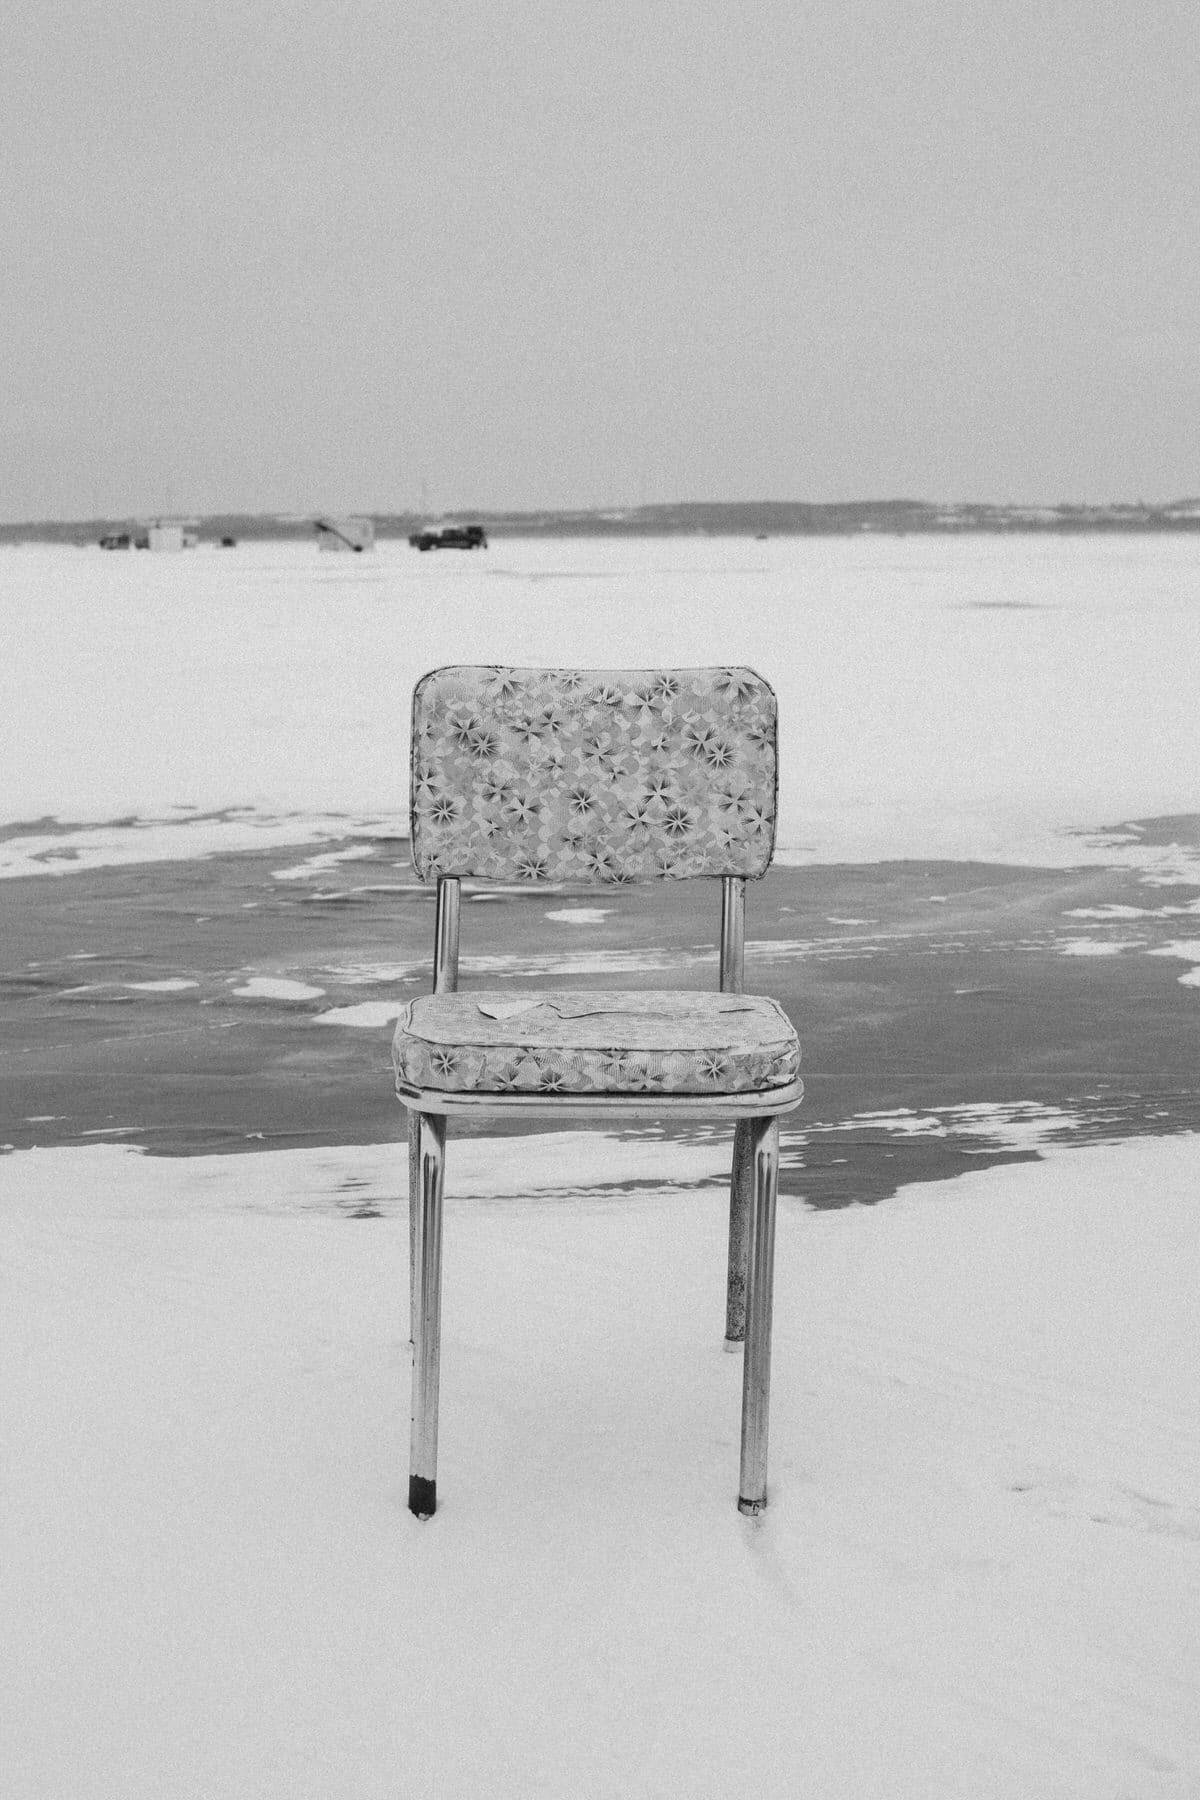 Lake-Winnebago-sturgeon-spearing-Fond-du-Lac-Wisconsin-black-and-white-fine-art-photography-by-Studio-L-photographer-Laura-Schneider-_9980